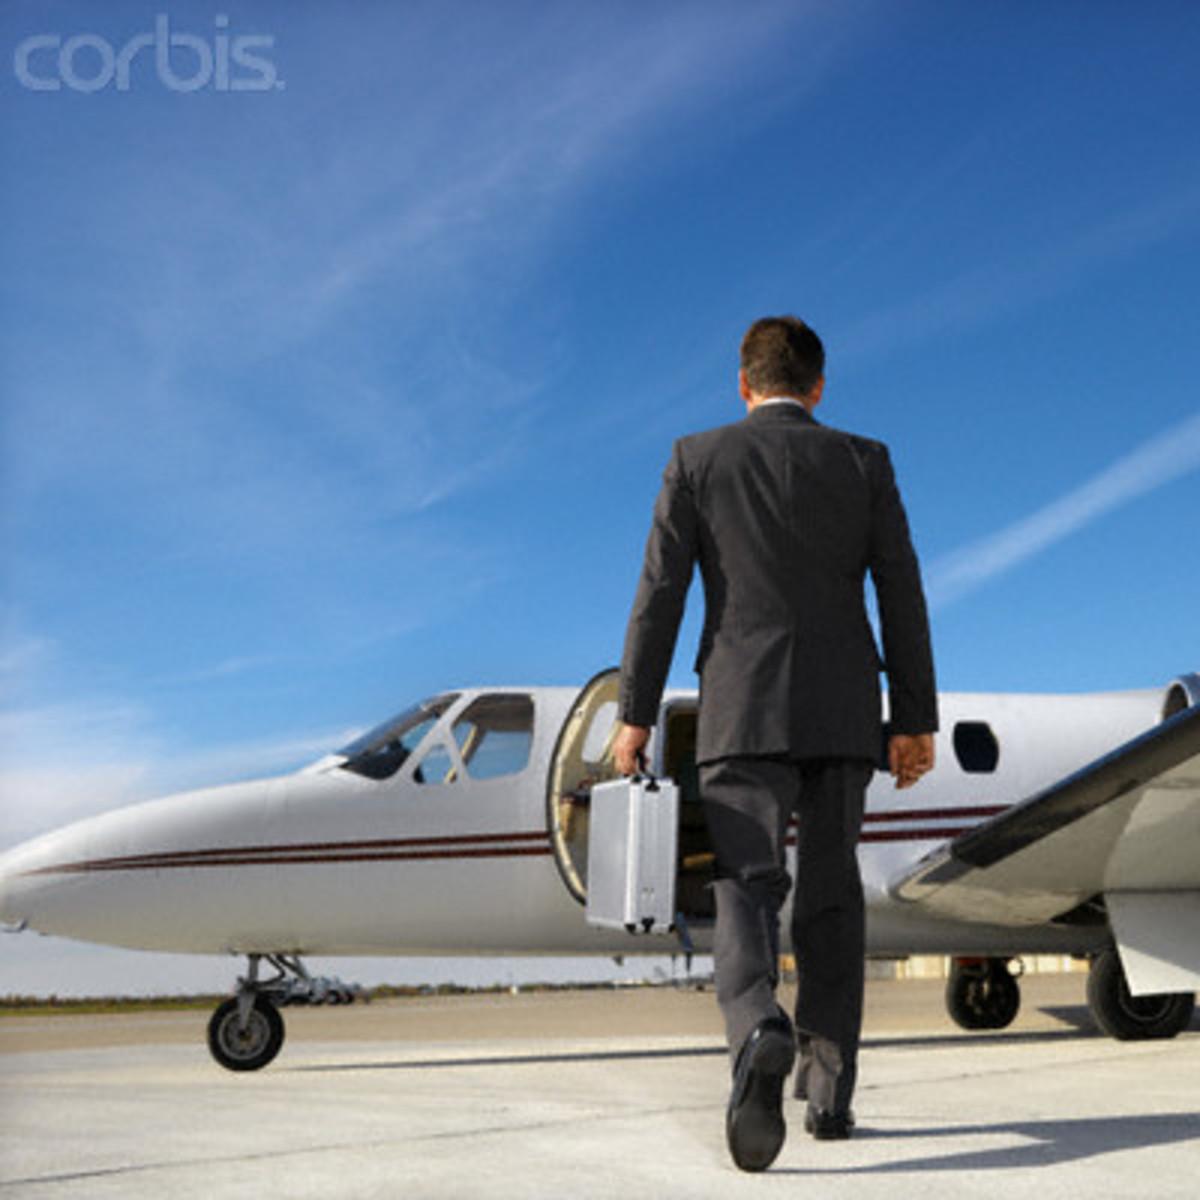 PRIVATE AIRCRAFT BOARDING PROCEDURE